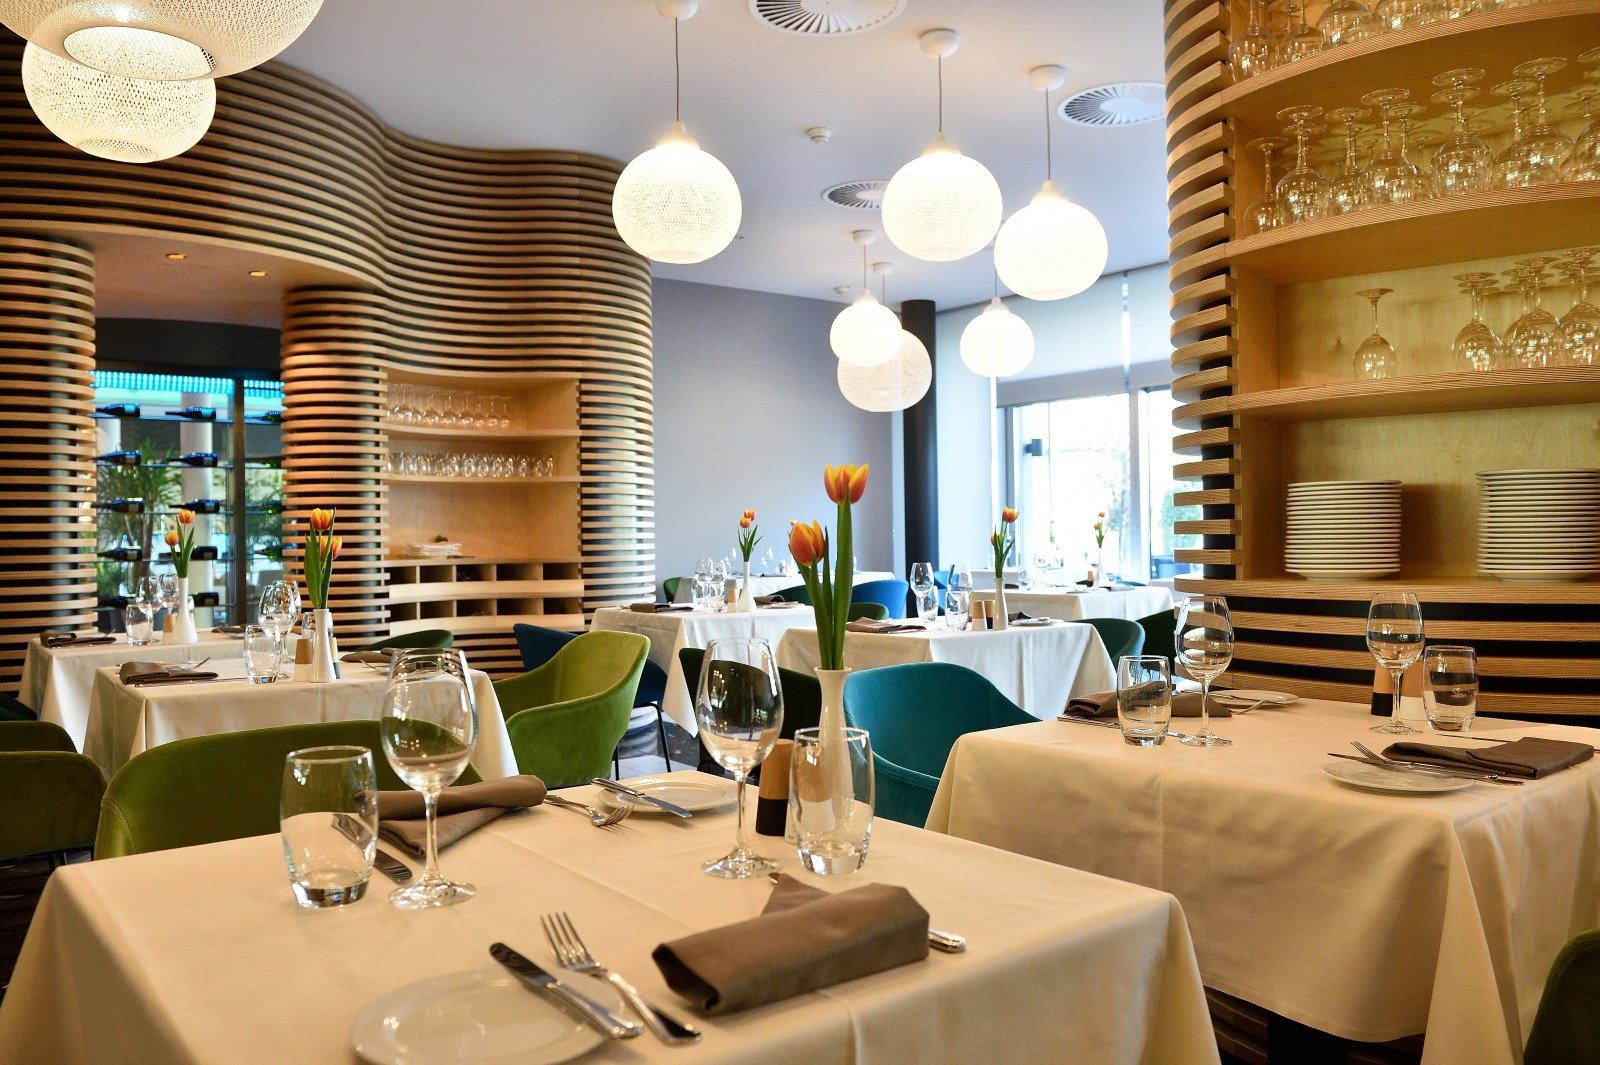 Hotels Vatel Martigny (Suisse) #29